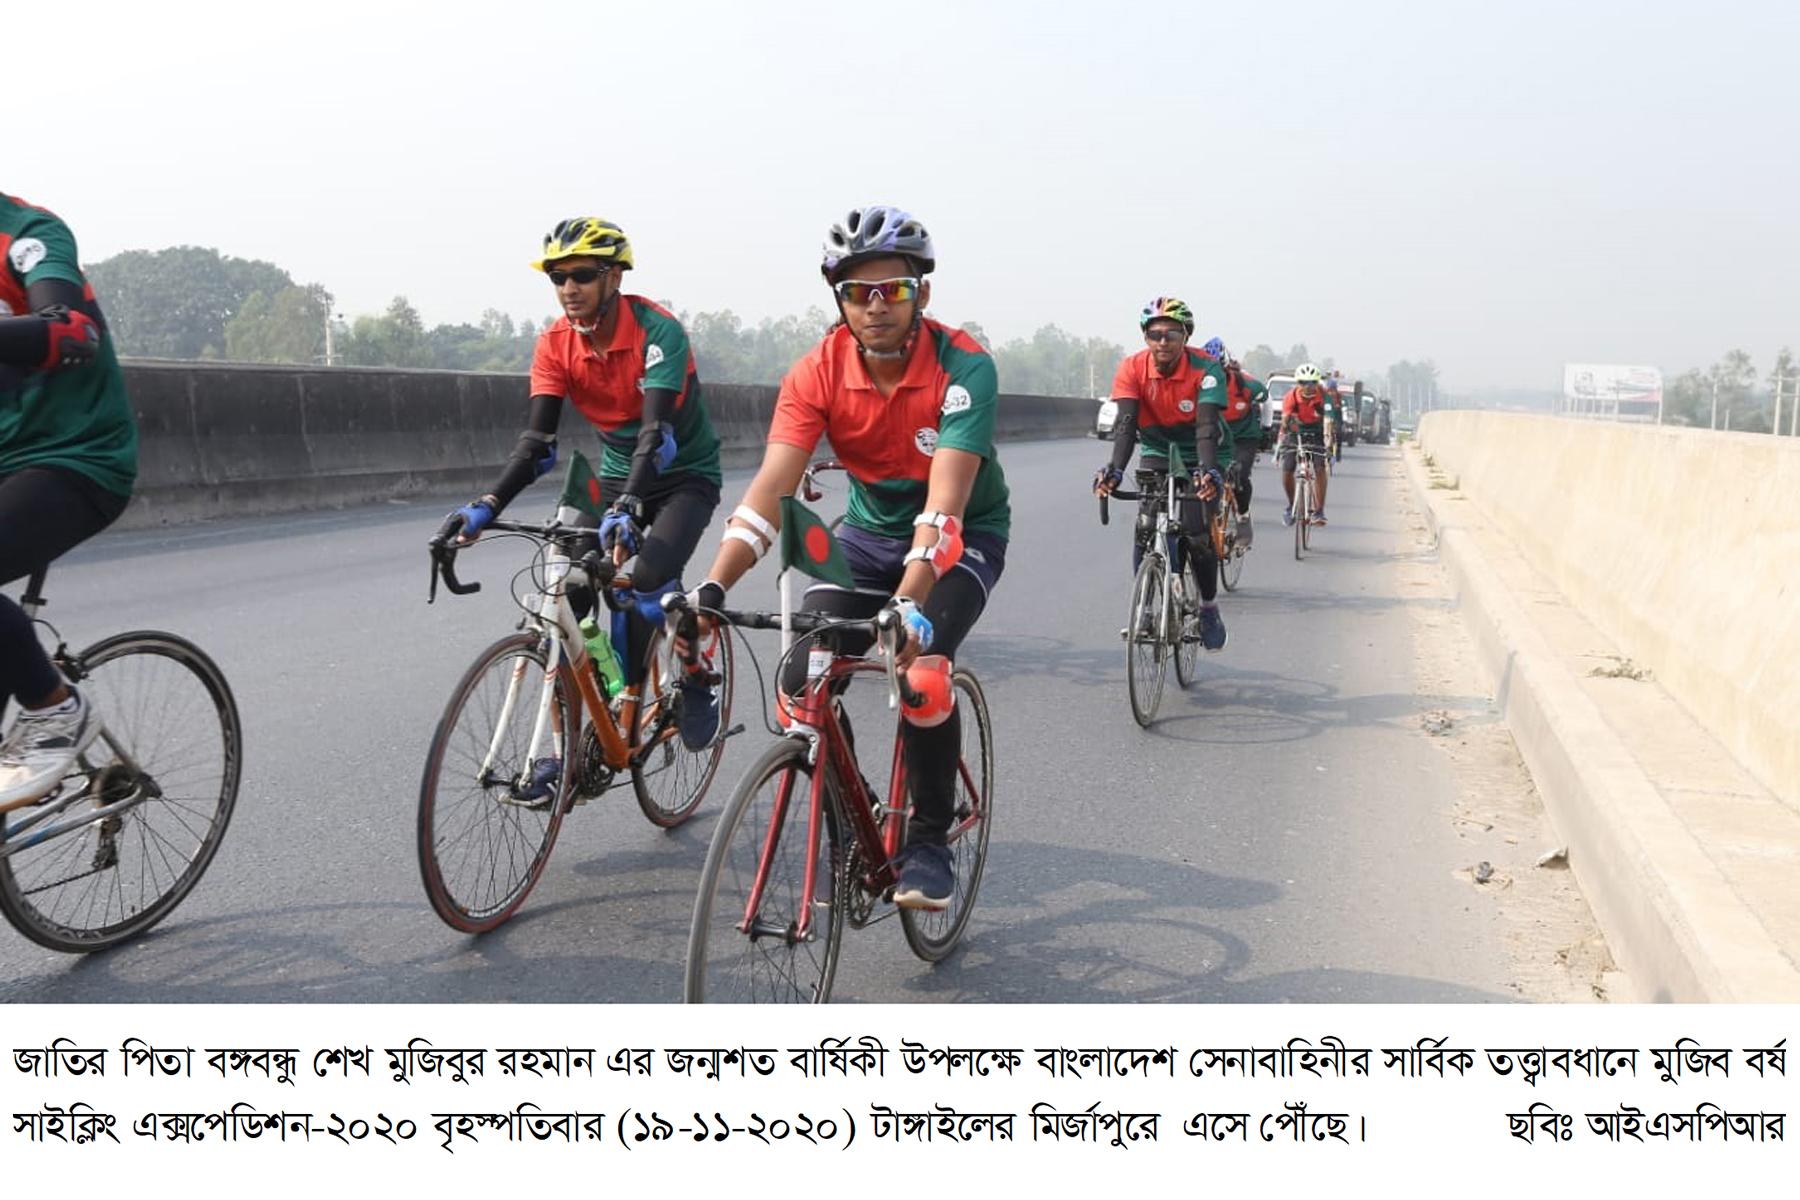 Army Cycling - 19-11-2020 (8)